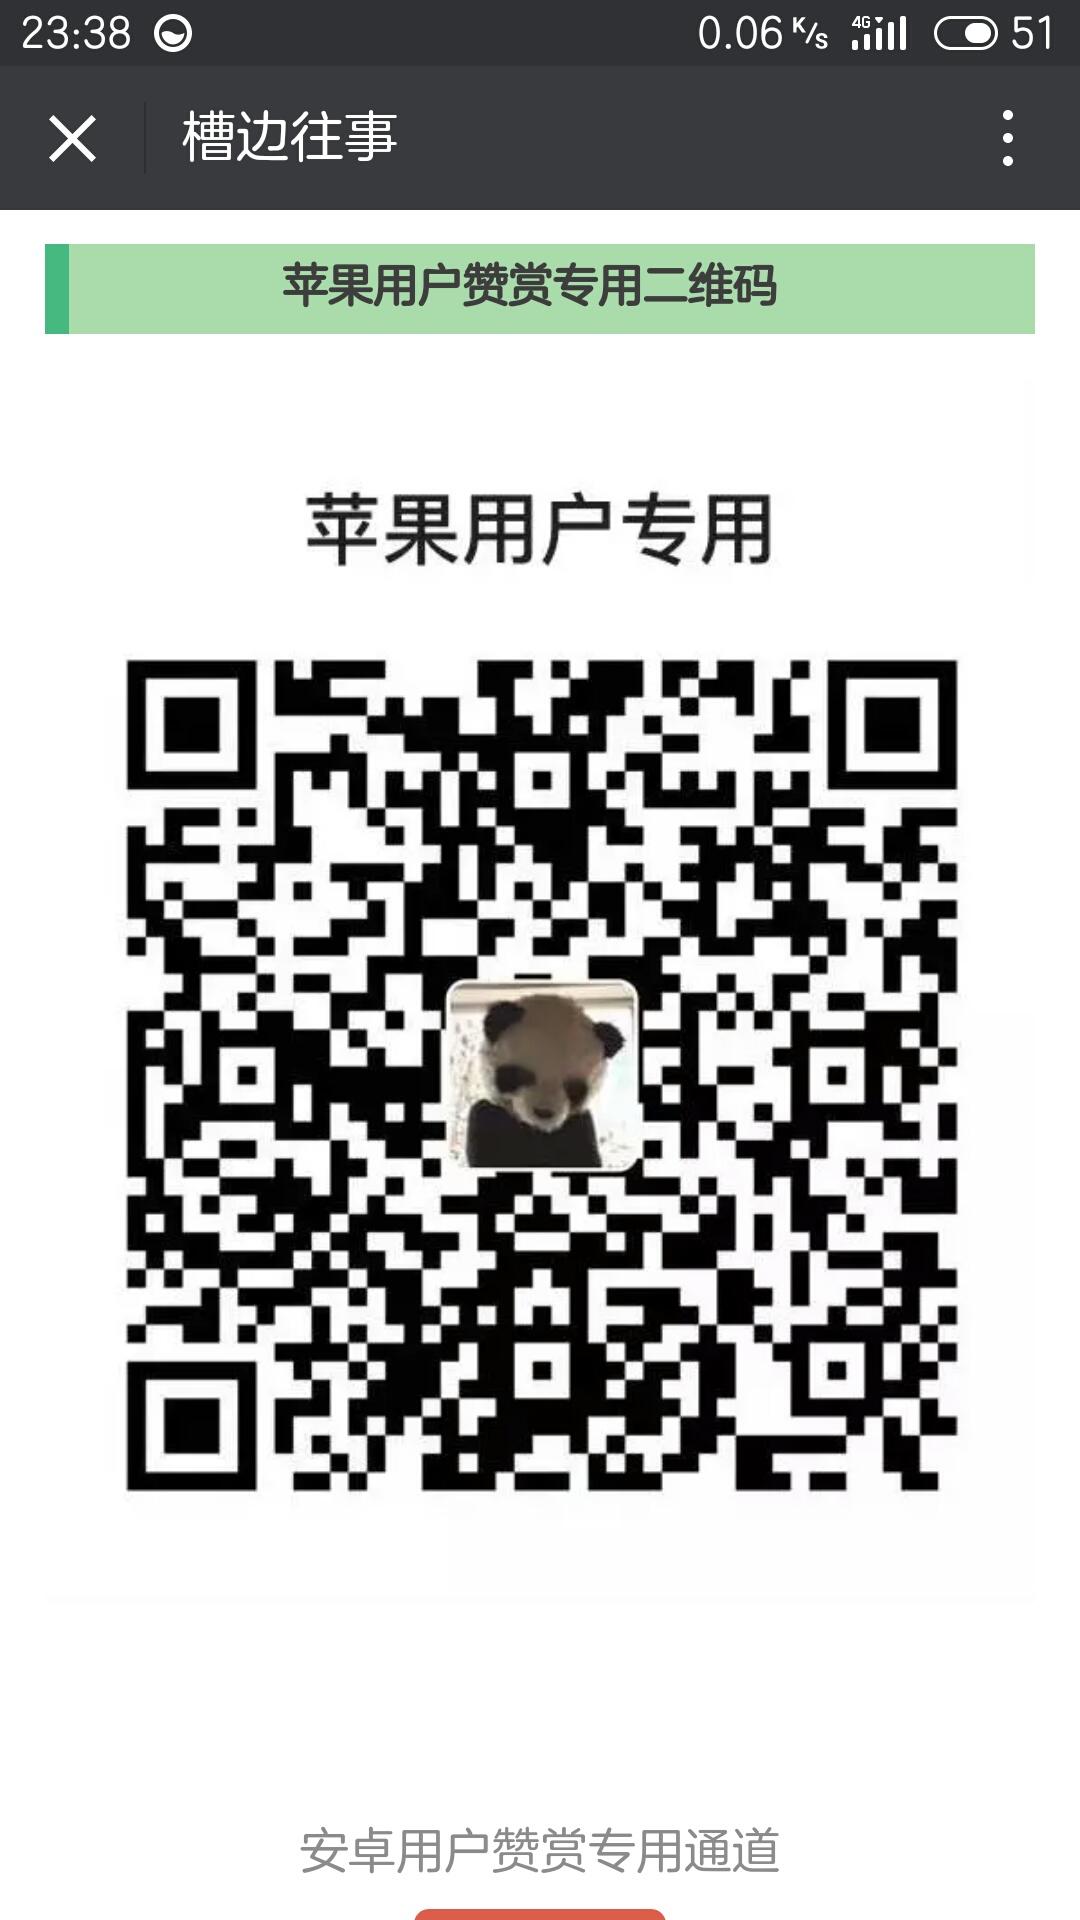 S70618-233817.jpg